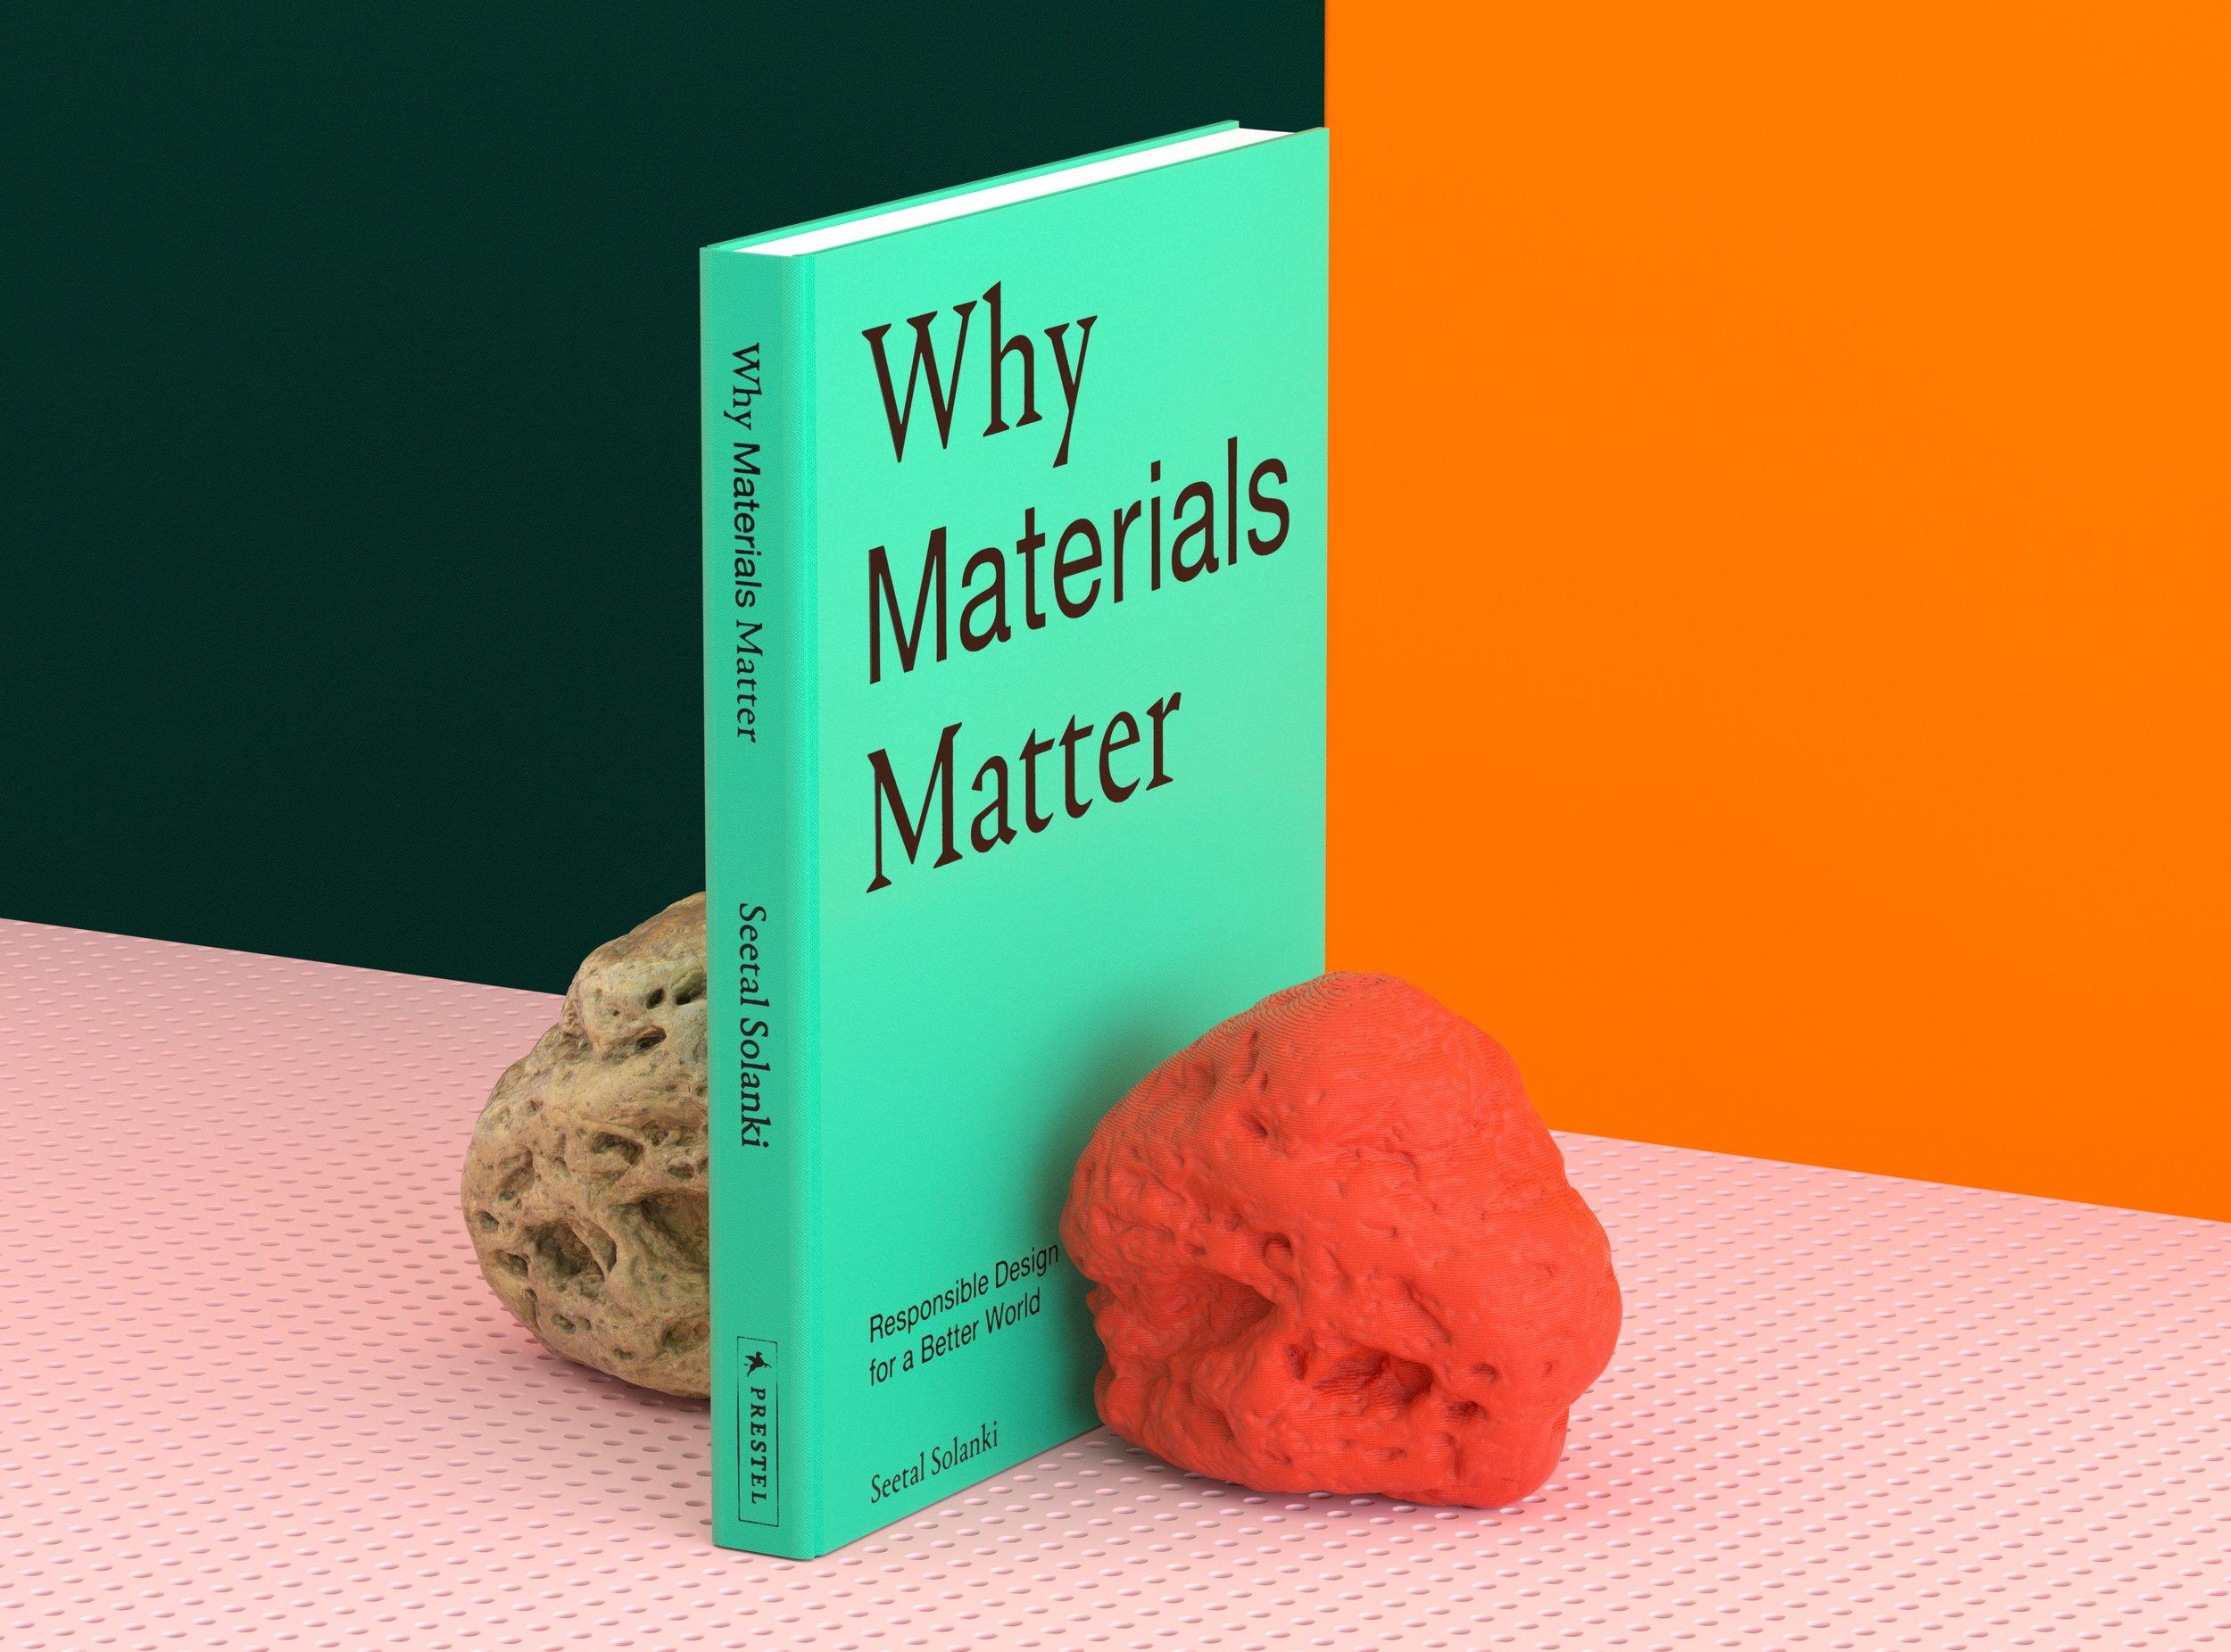 MaterialMatters_Bookend_Viz_HEM_004_2.jpg